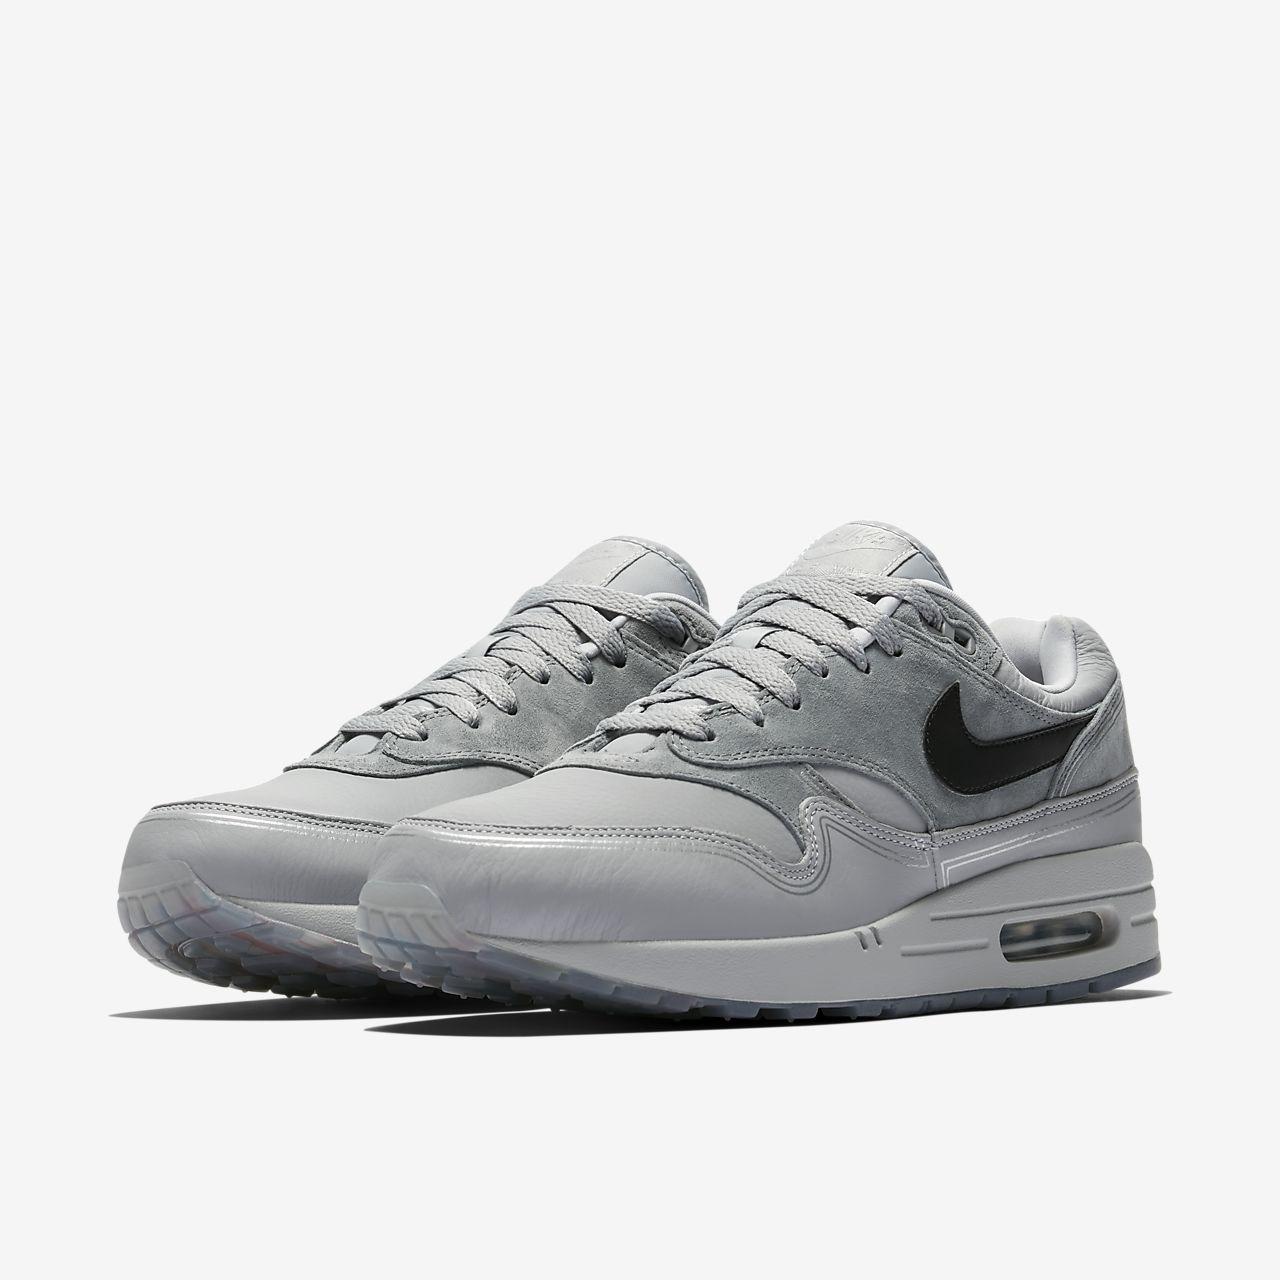 Nike Air Max 90 High Fur Dunkel Grau Schwarz Verkauf Kaufen